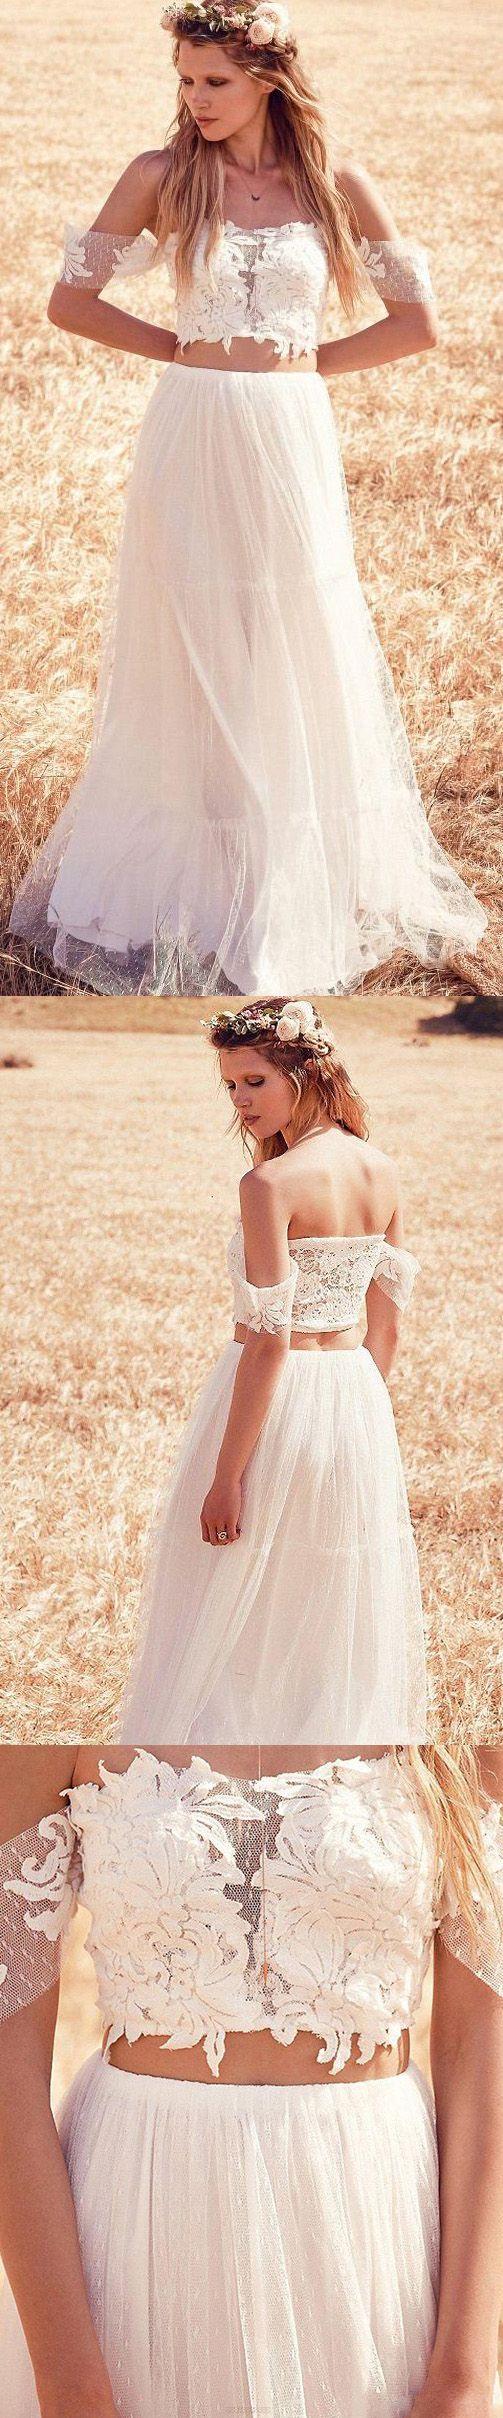 Long alineprincess wedding dresses ivory short sleeve with lace